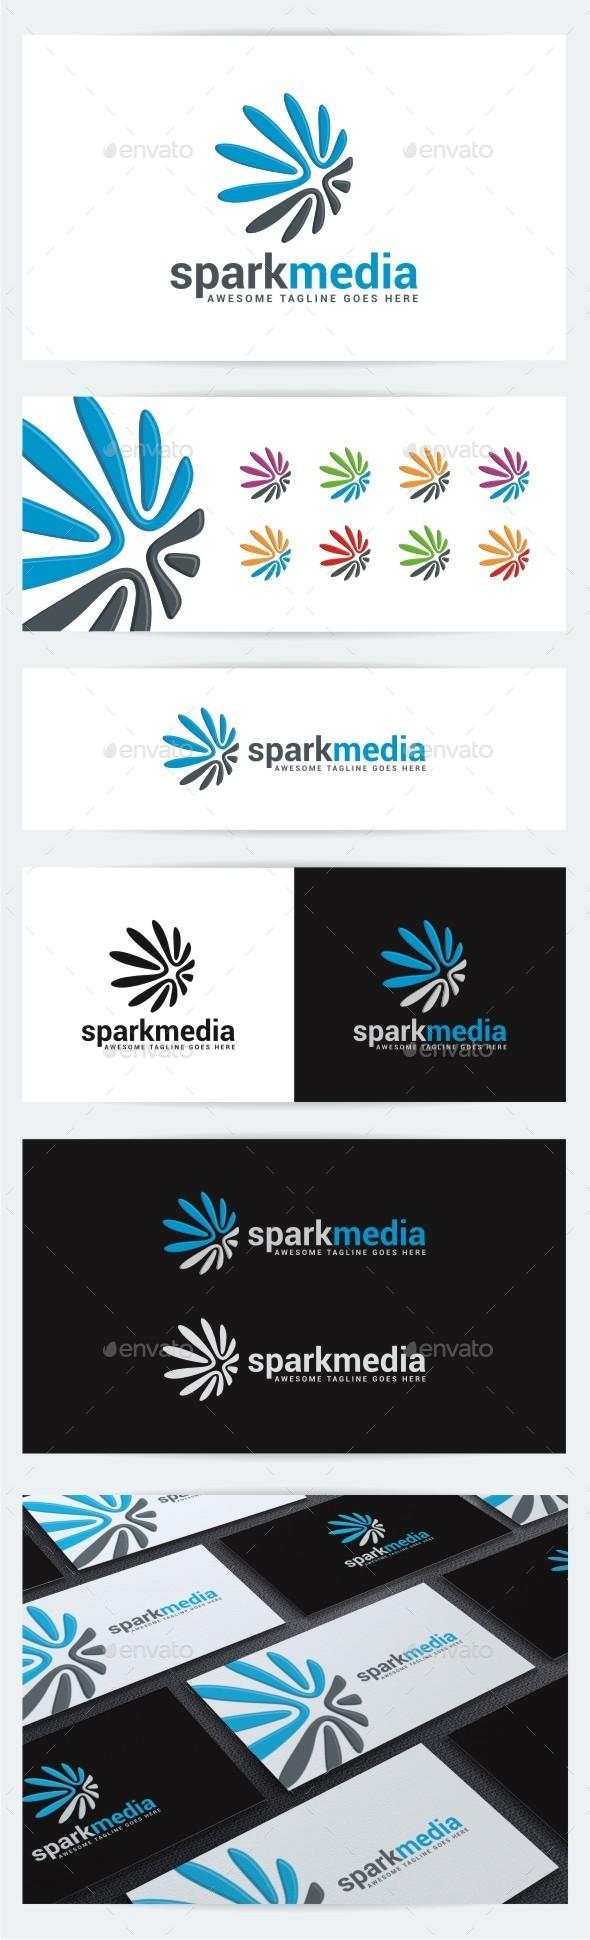 GraphicRiver Spark Media 10509032